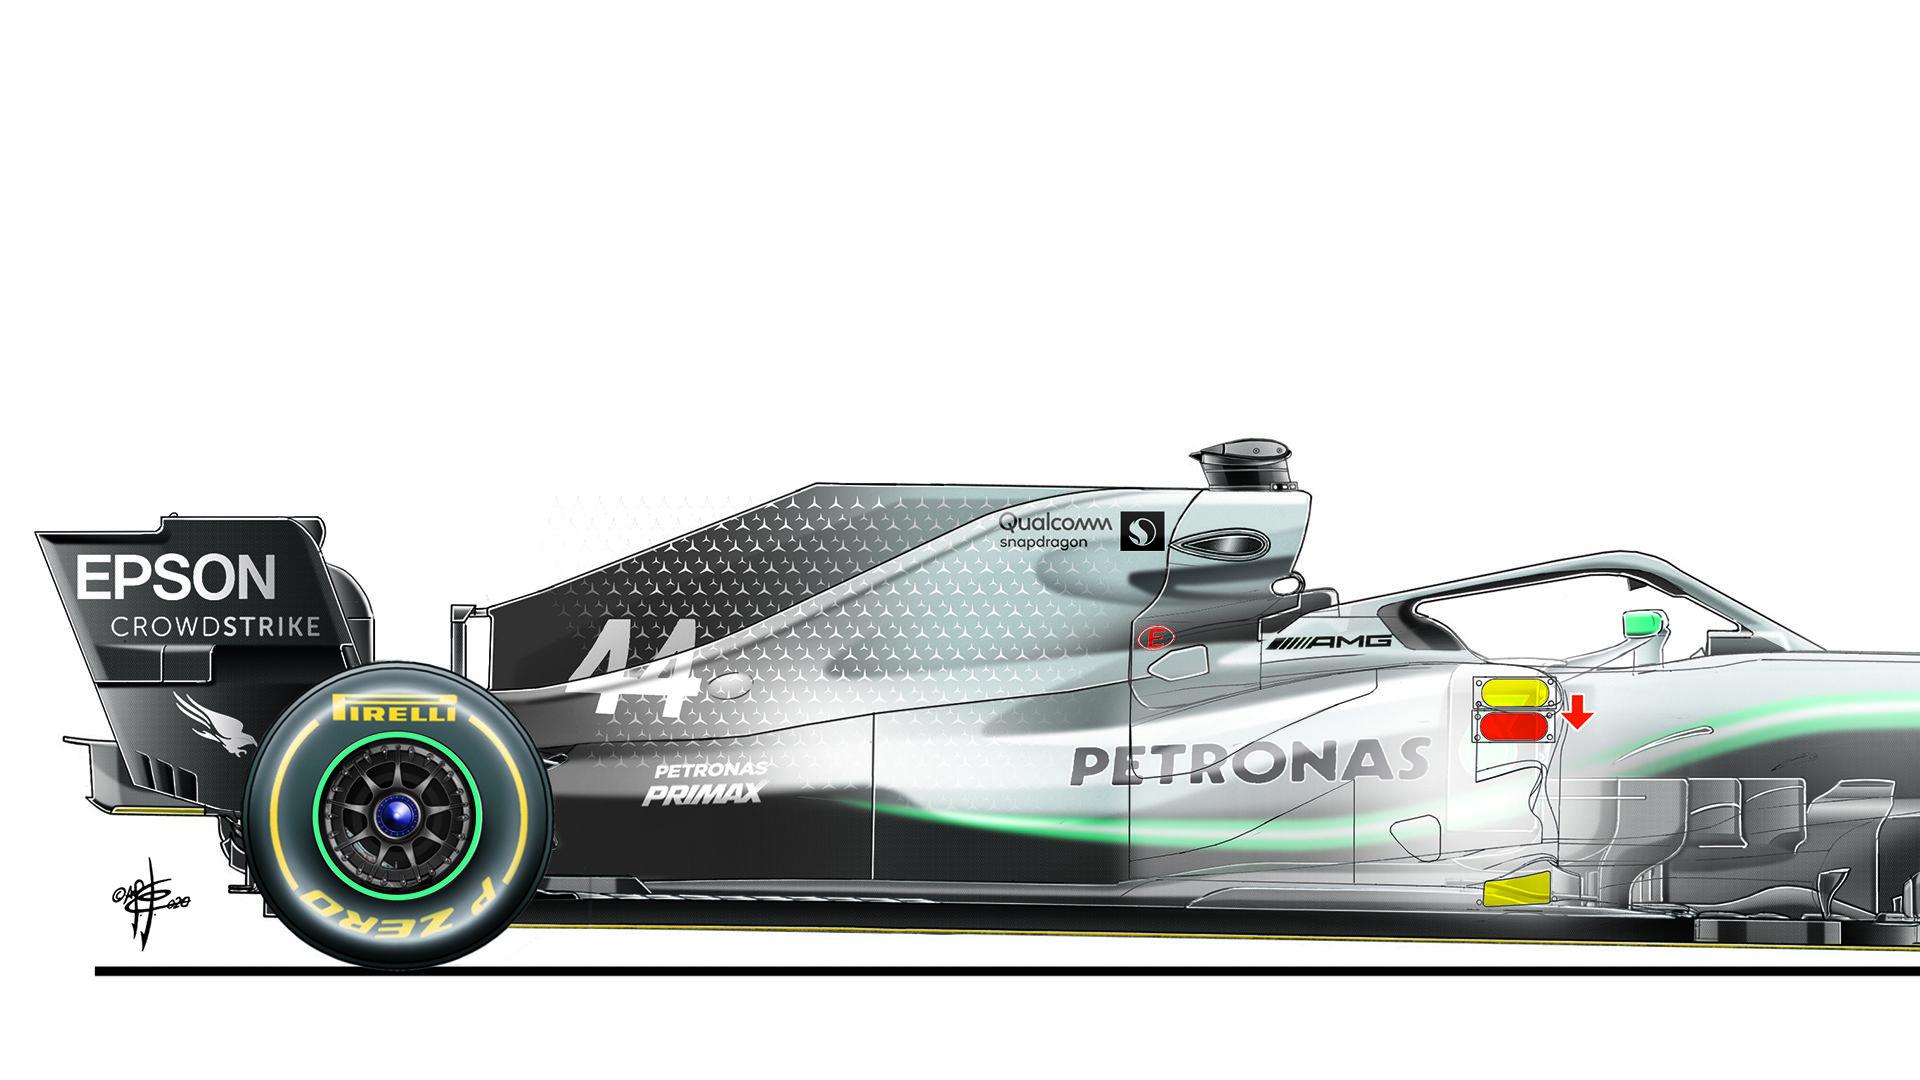 Tech Insight How A Ferrari Like Sidepod Tweak Could Help Mercedes Go Even Faster In 2020 Formula 1 In 2020 Ferrari Mercedes Formula 1